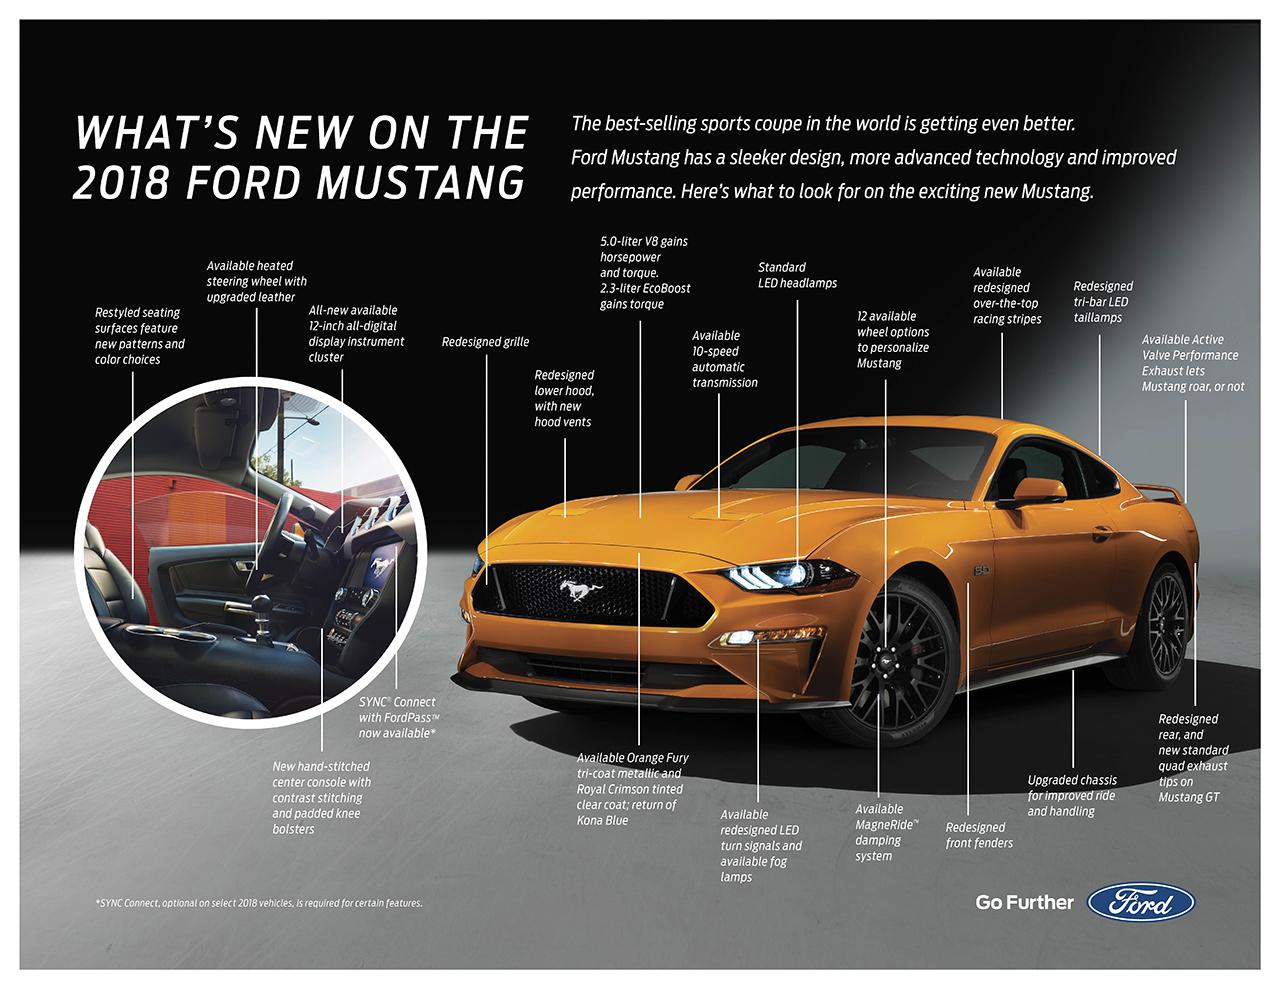 2018 Ford Mustang Fact Sheet